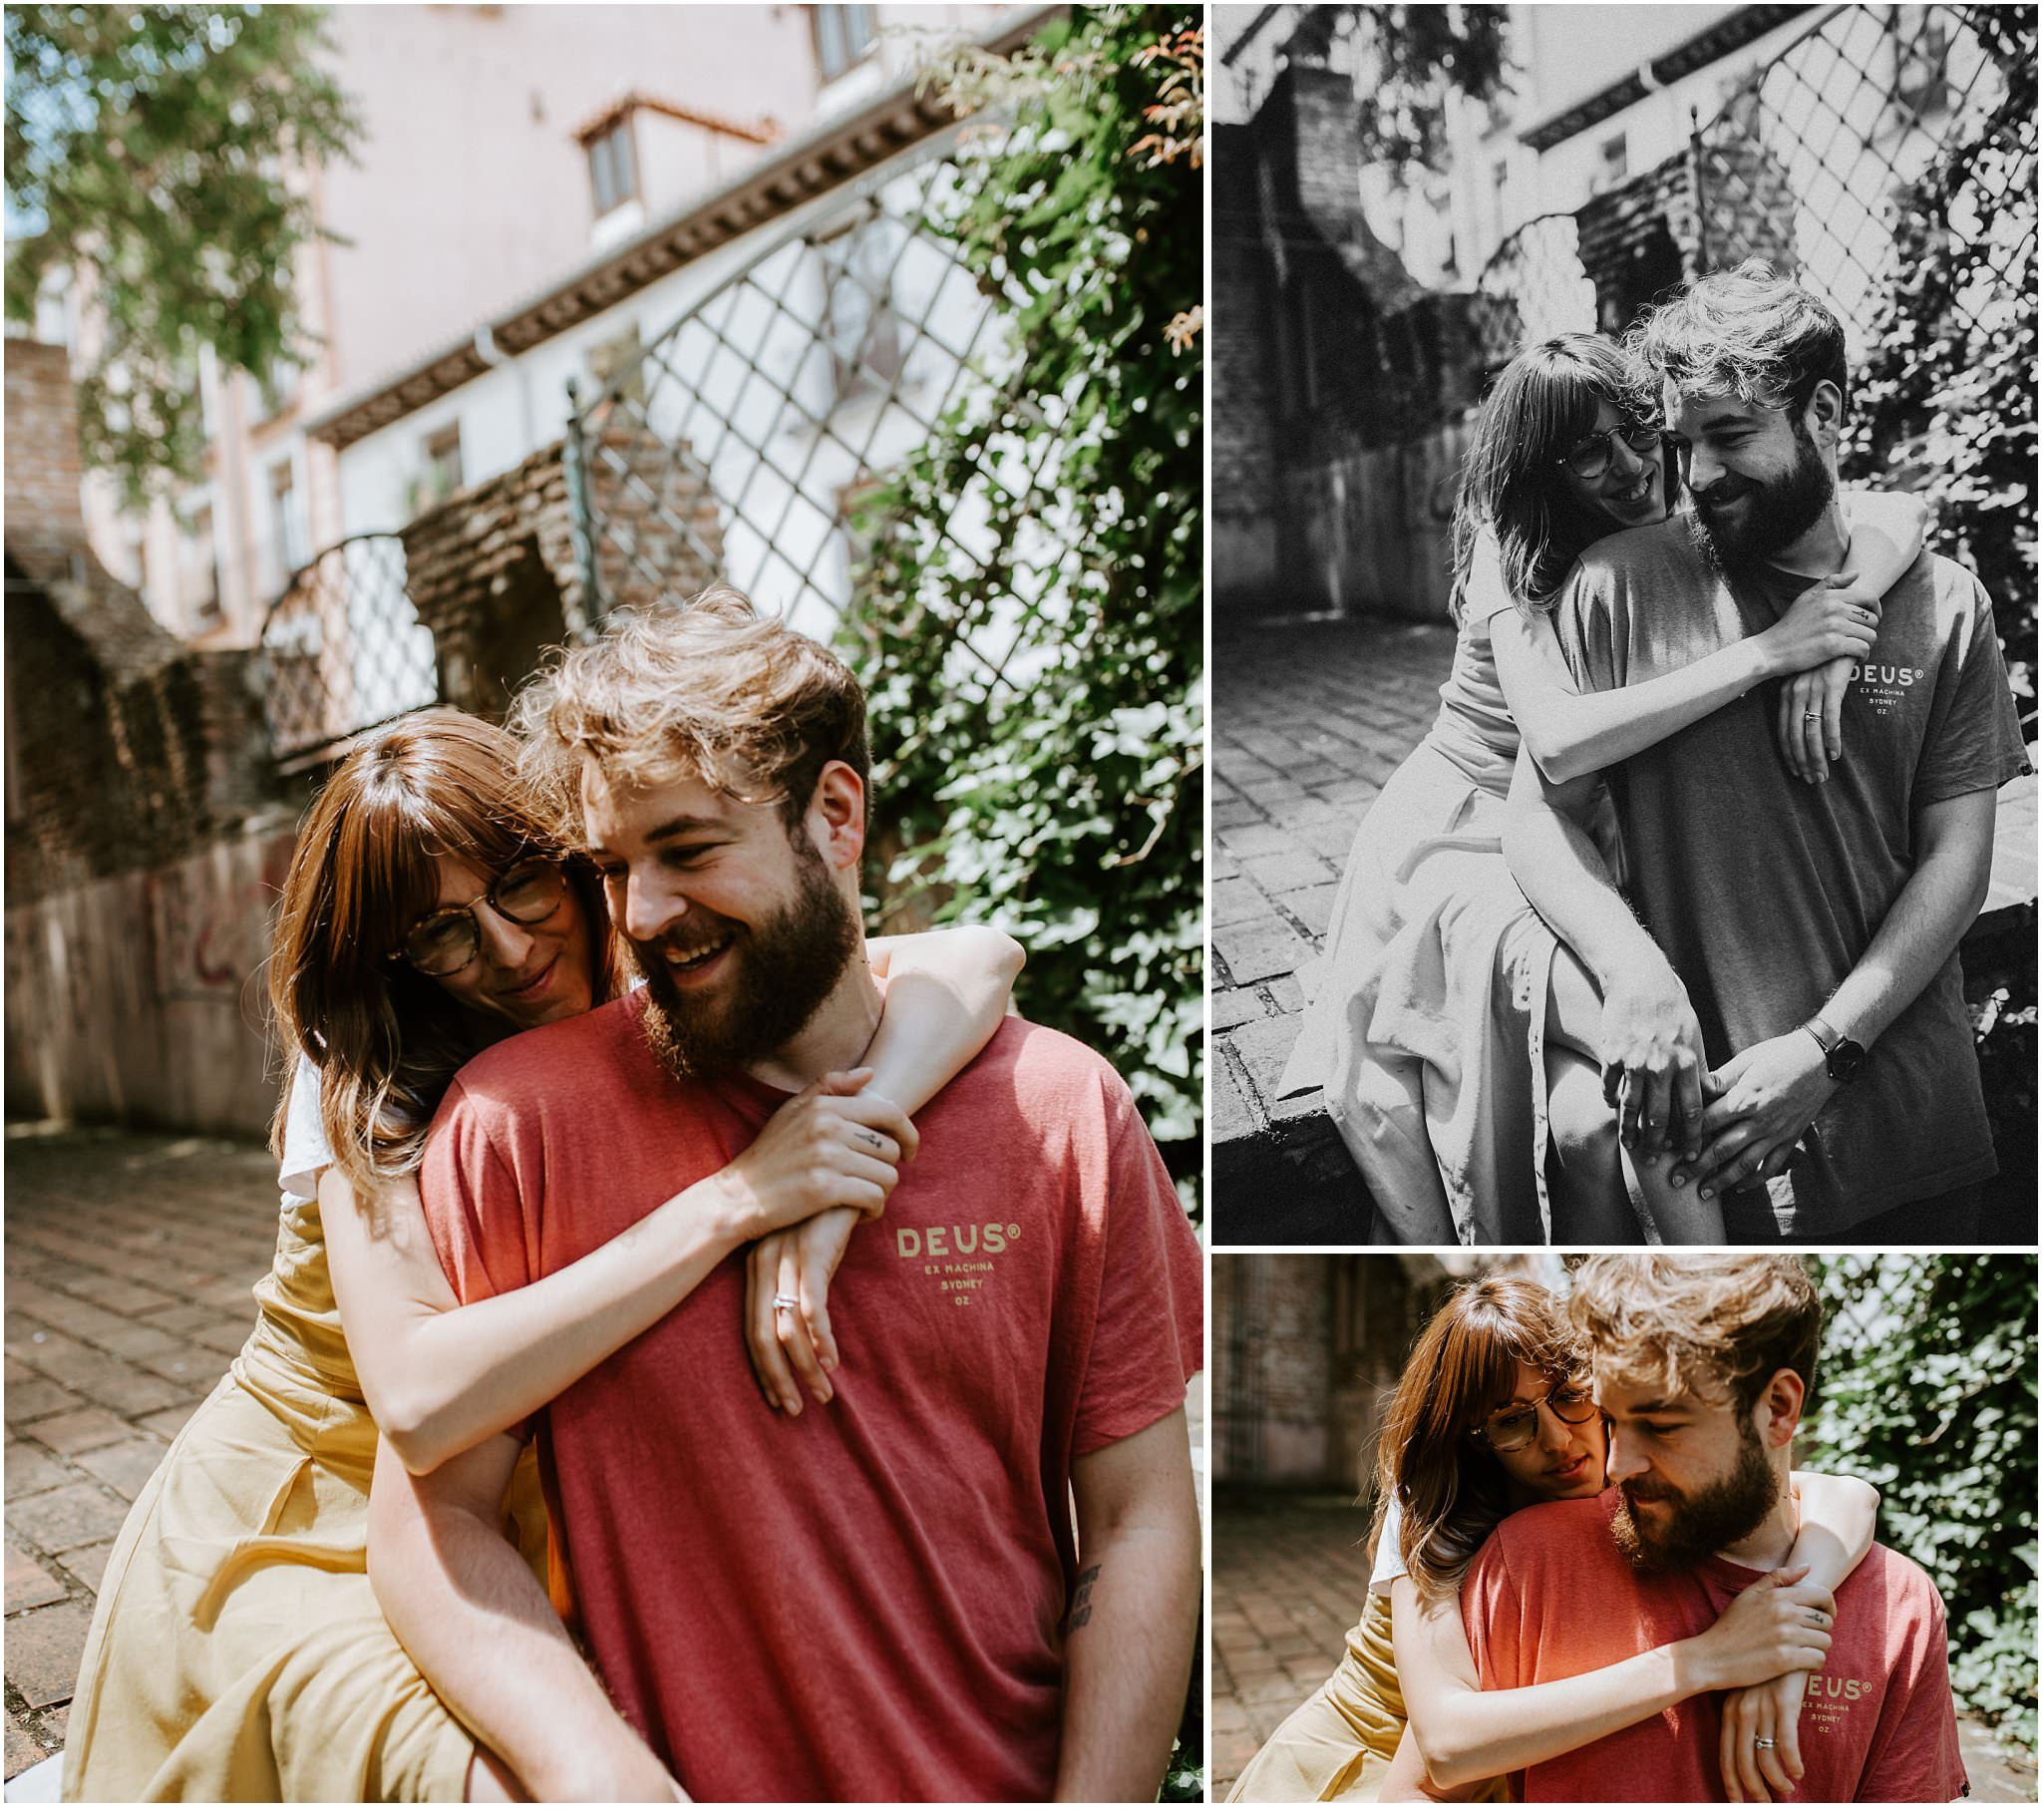 fotografo-rosario-argentina-bodas-weddingphotography 101.jpg